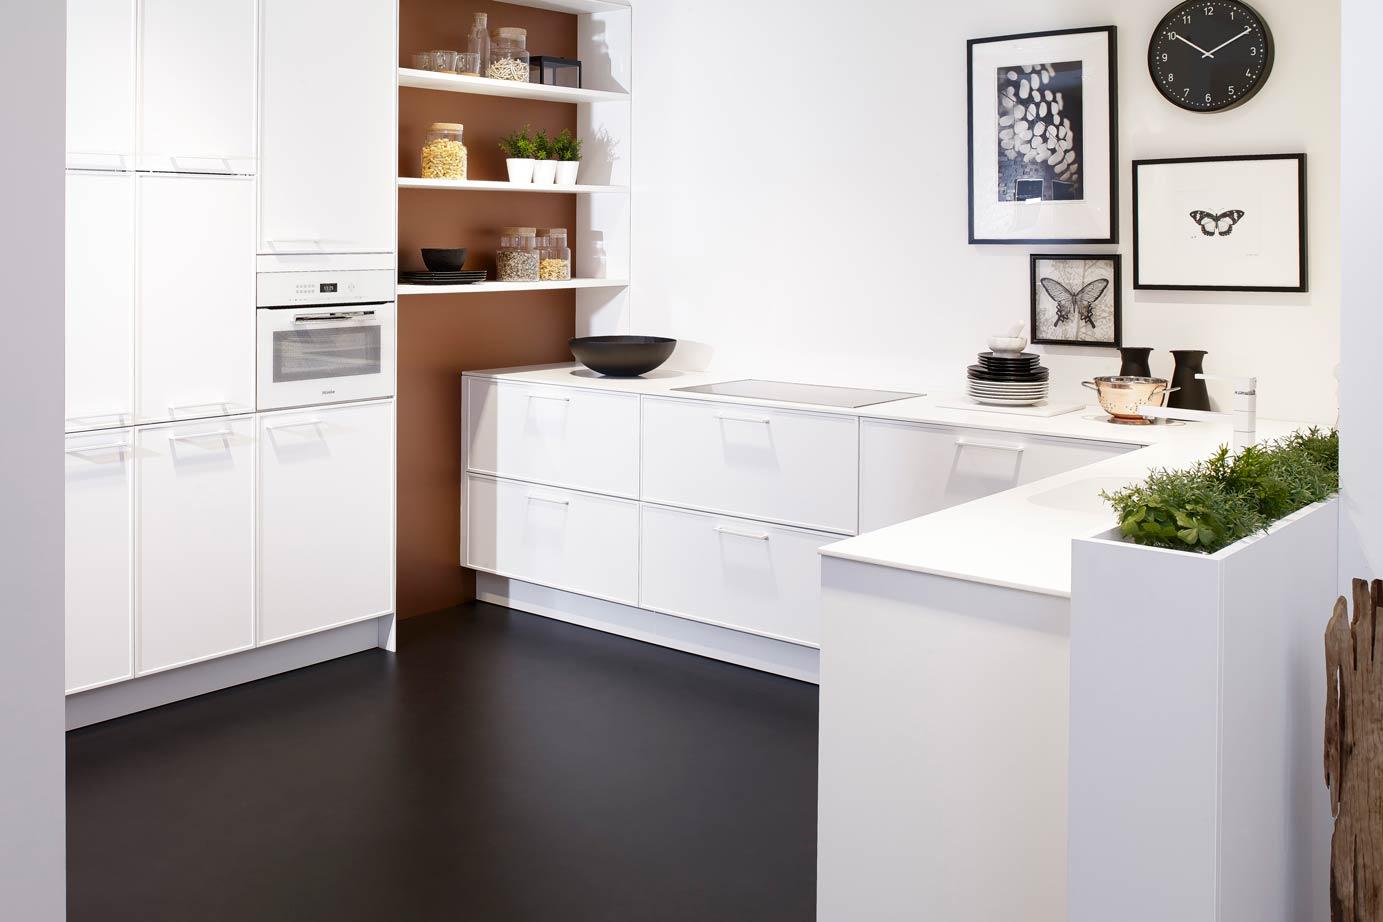 Witte ton sur ton design keuken met miele apparatuur db keukens